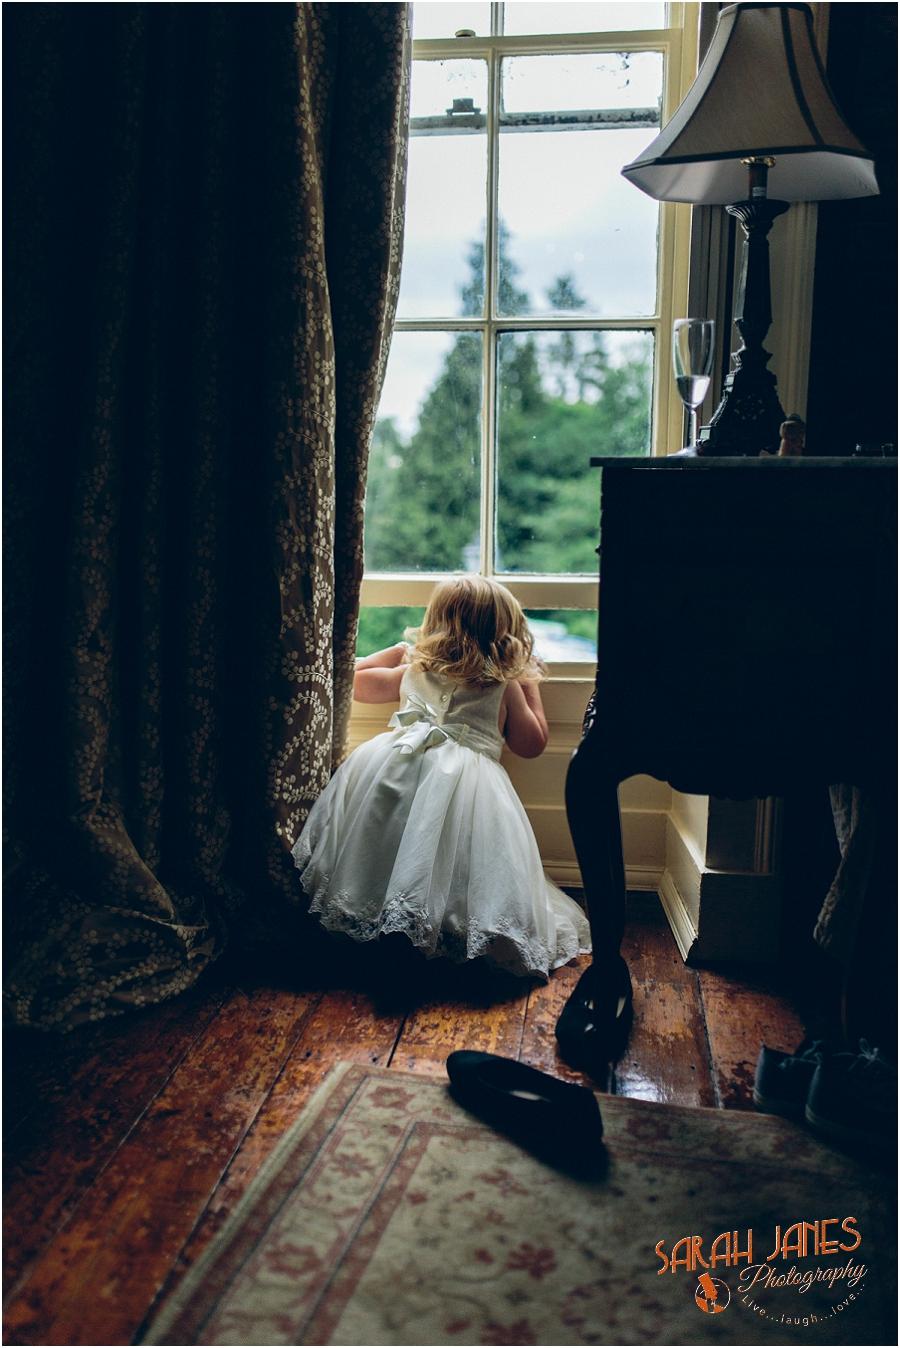 Sarah Janes Photography, Plas Hafod wedding photography, North wales wedding photographer_0008.jpg